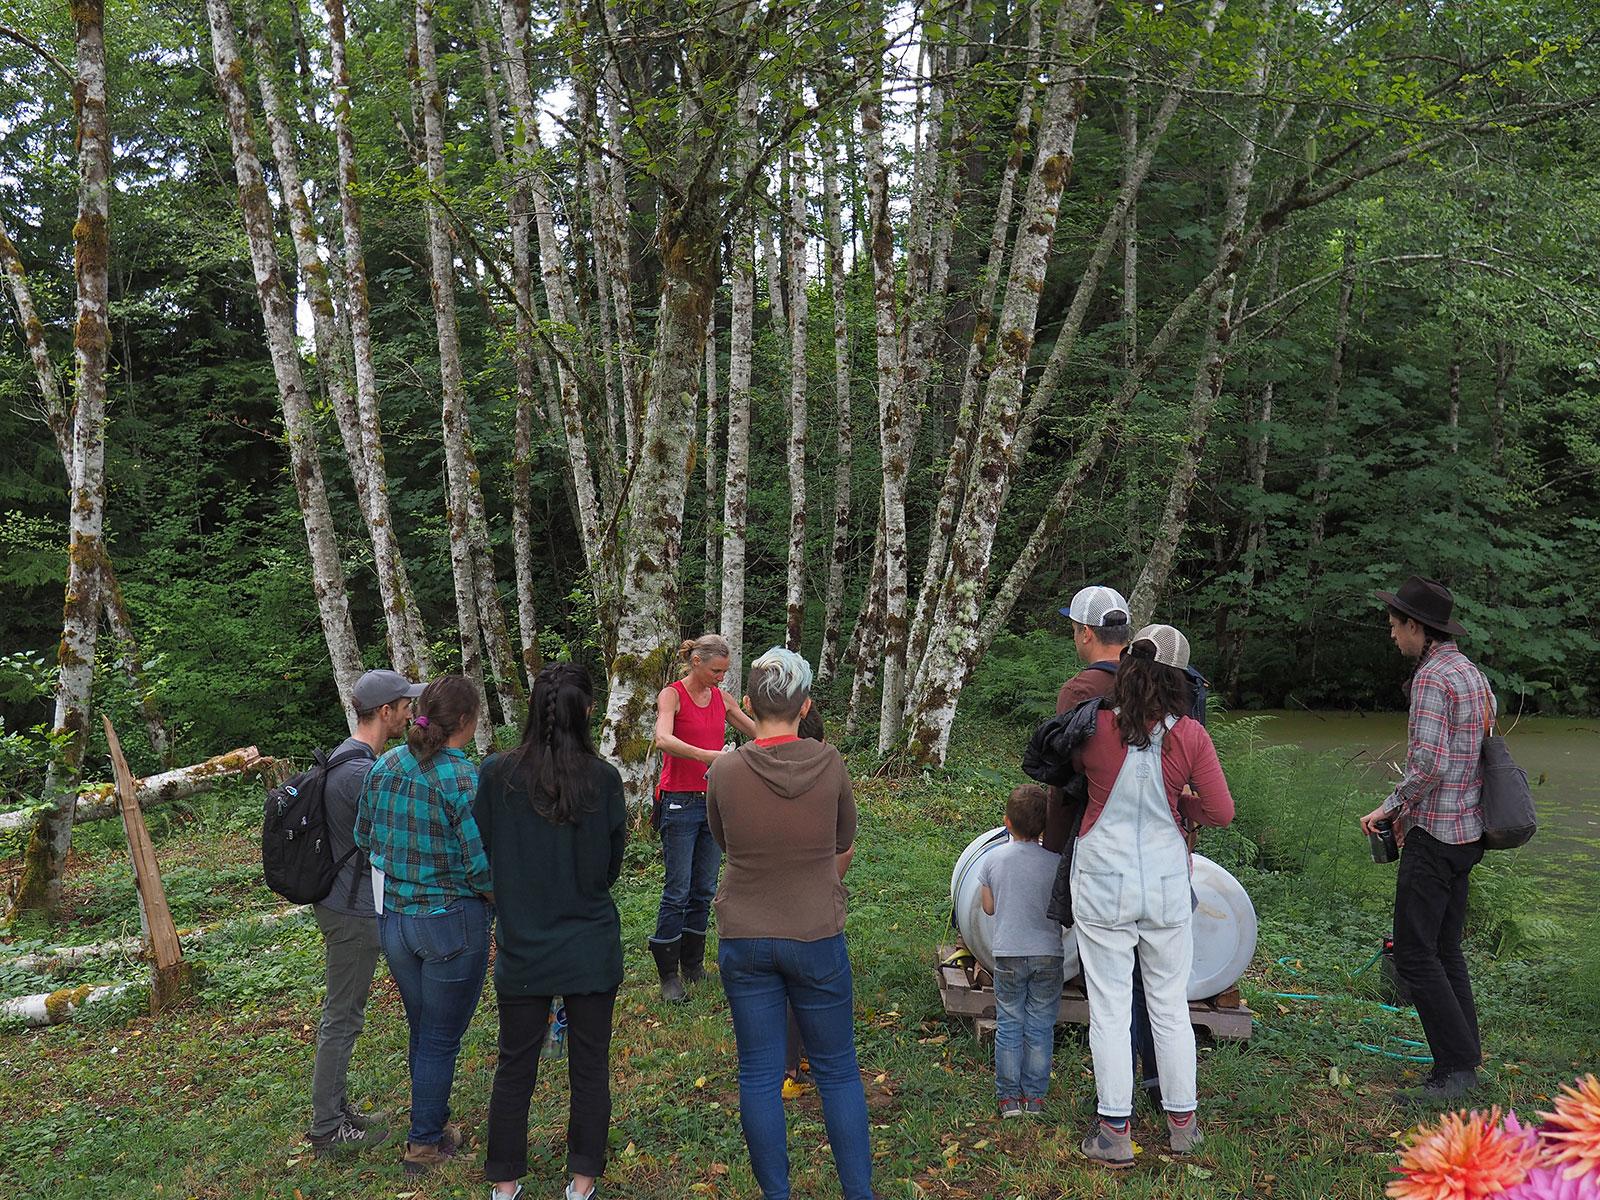 methodcamp at the woods careen stoll 2019.jpg